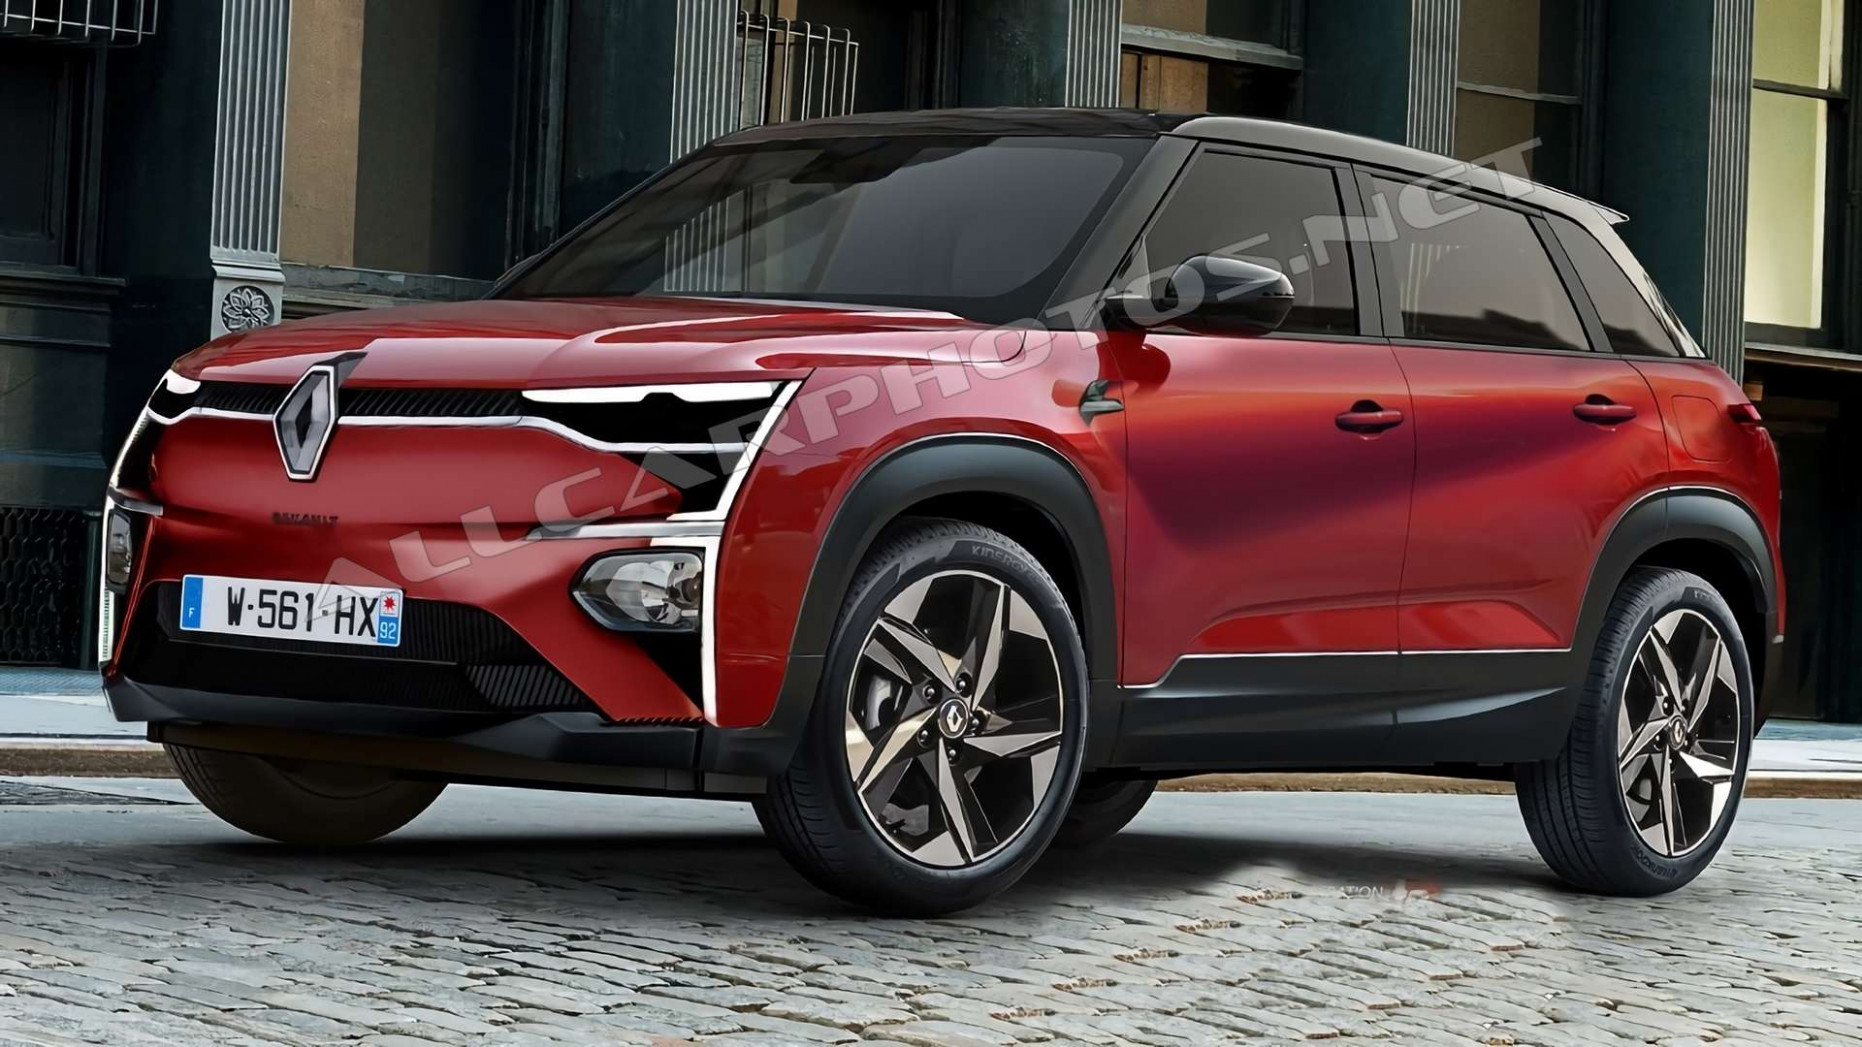 Images 2022 Renault Kadjar